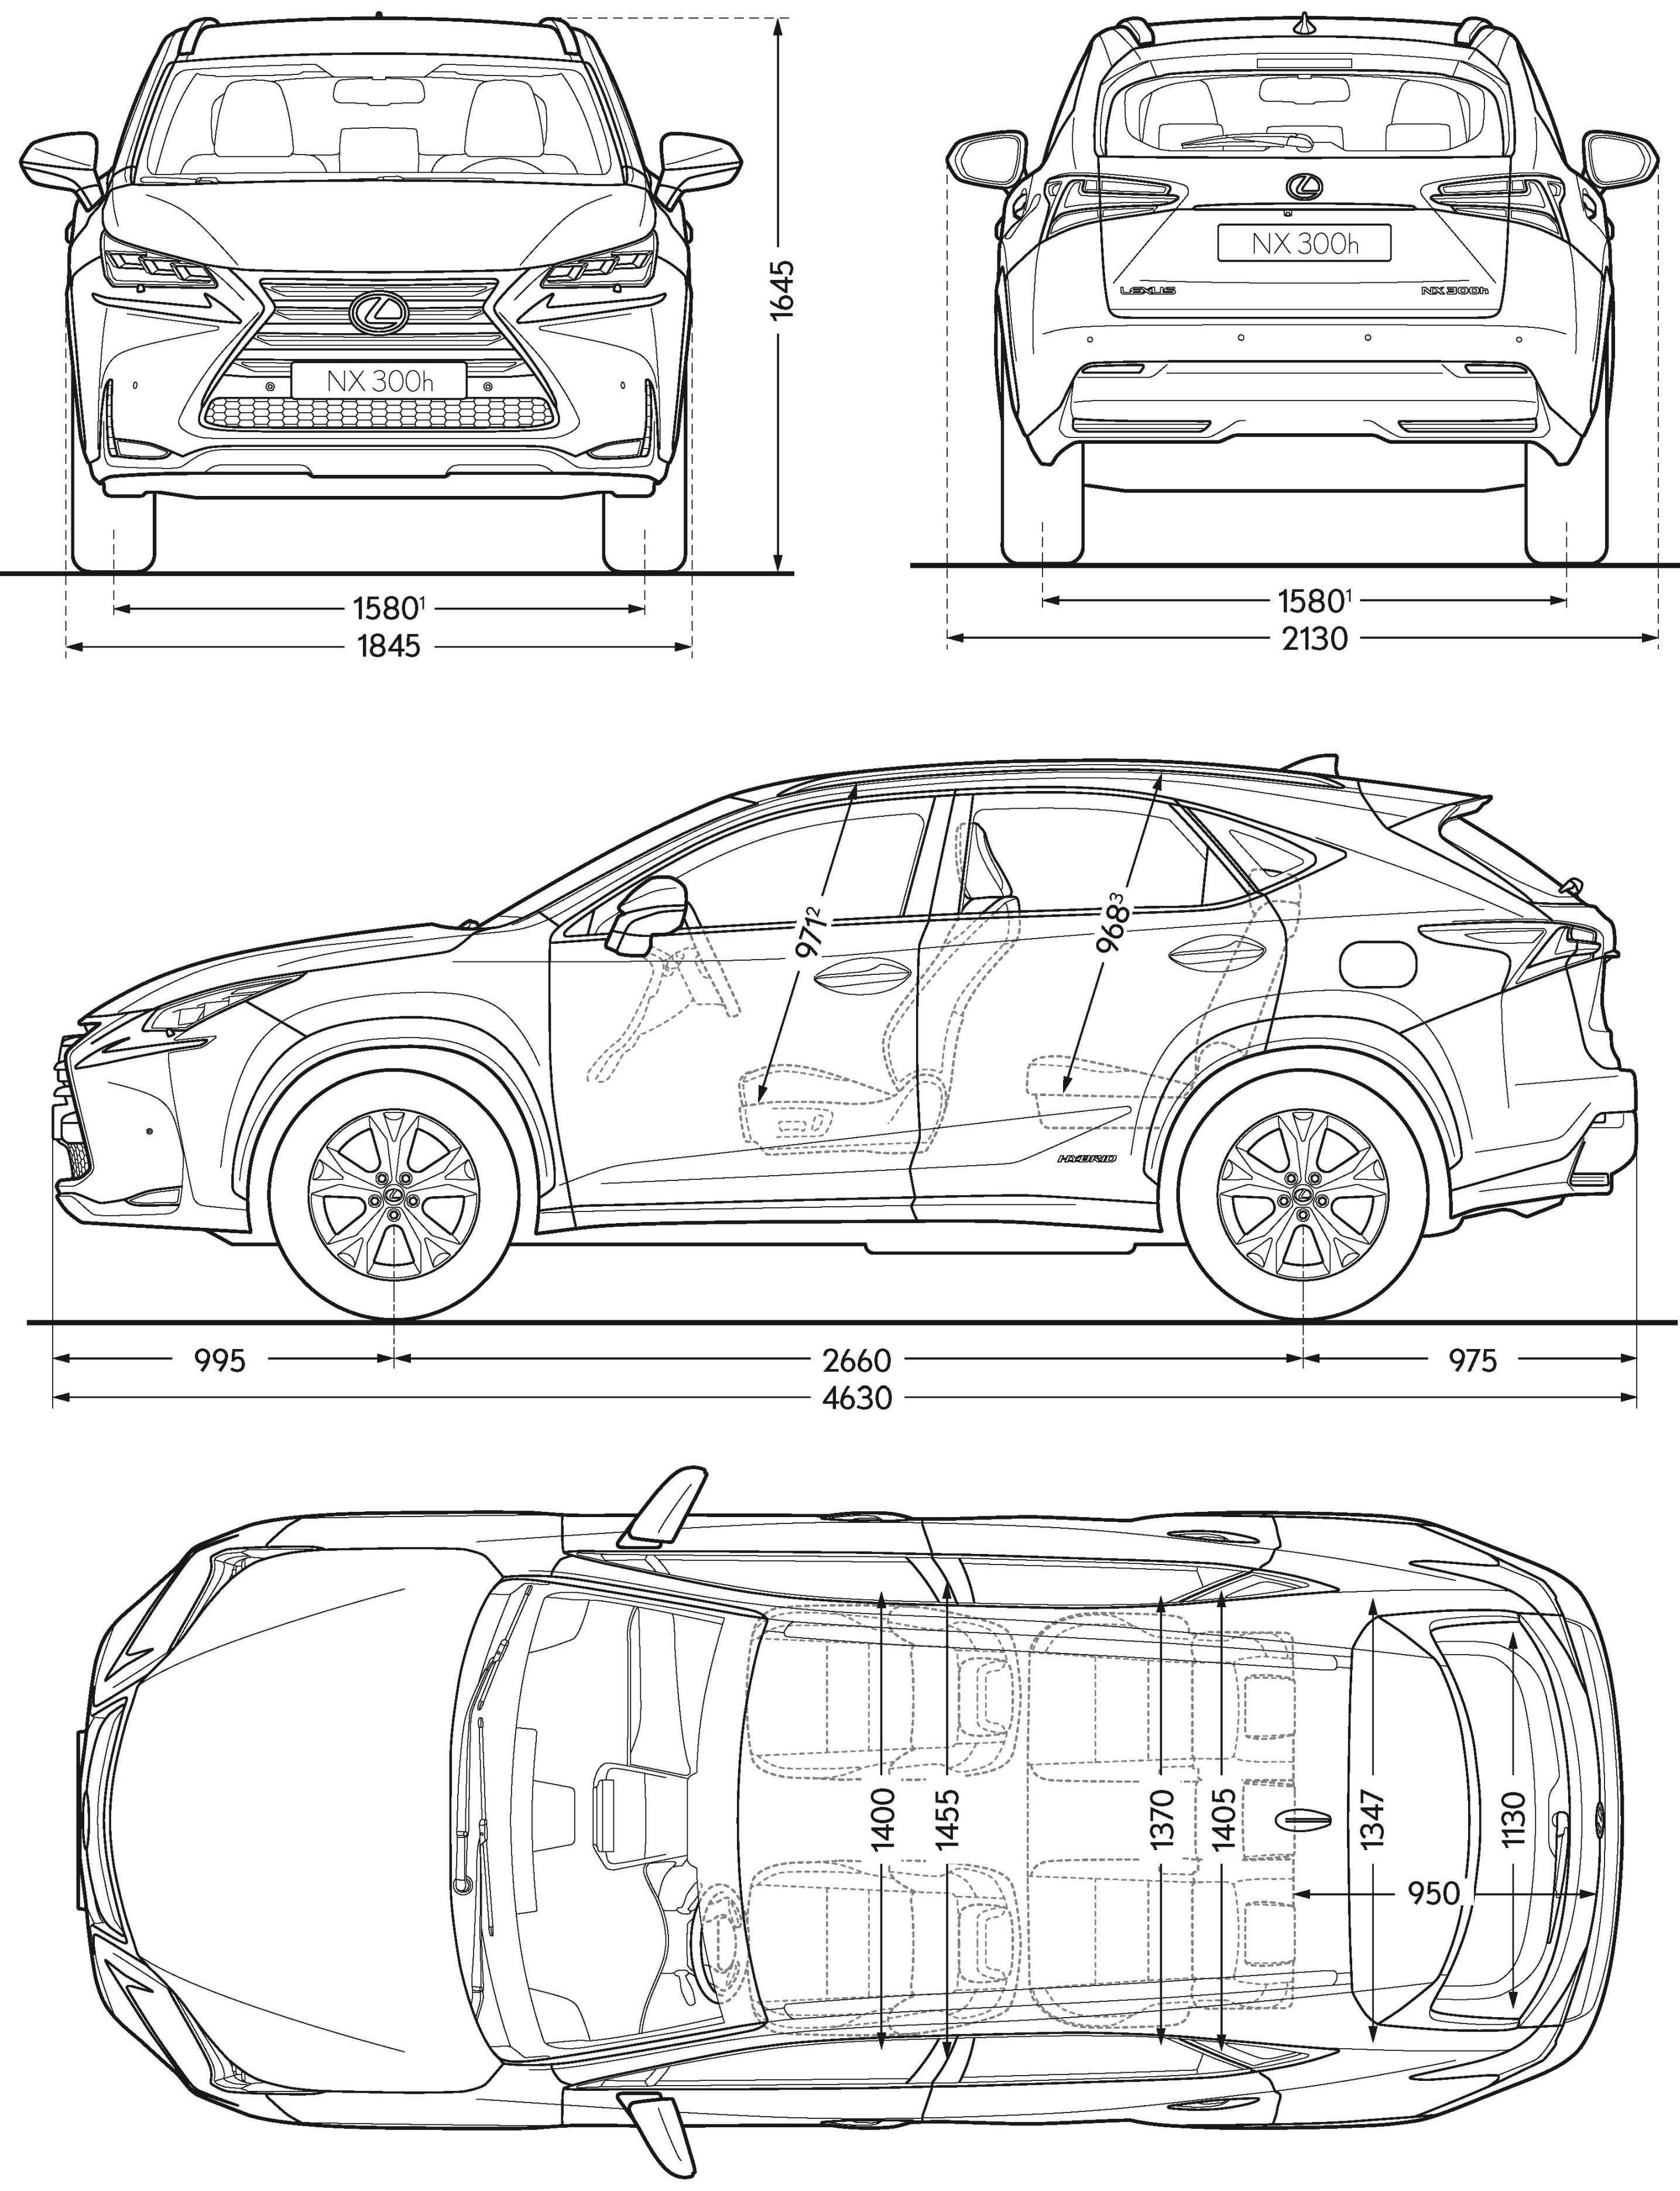 Lexus Nx 300h 2014 Blueprint Download Free Blueprint For